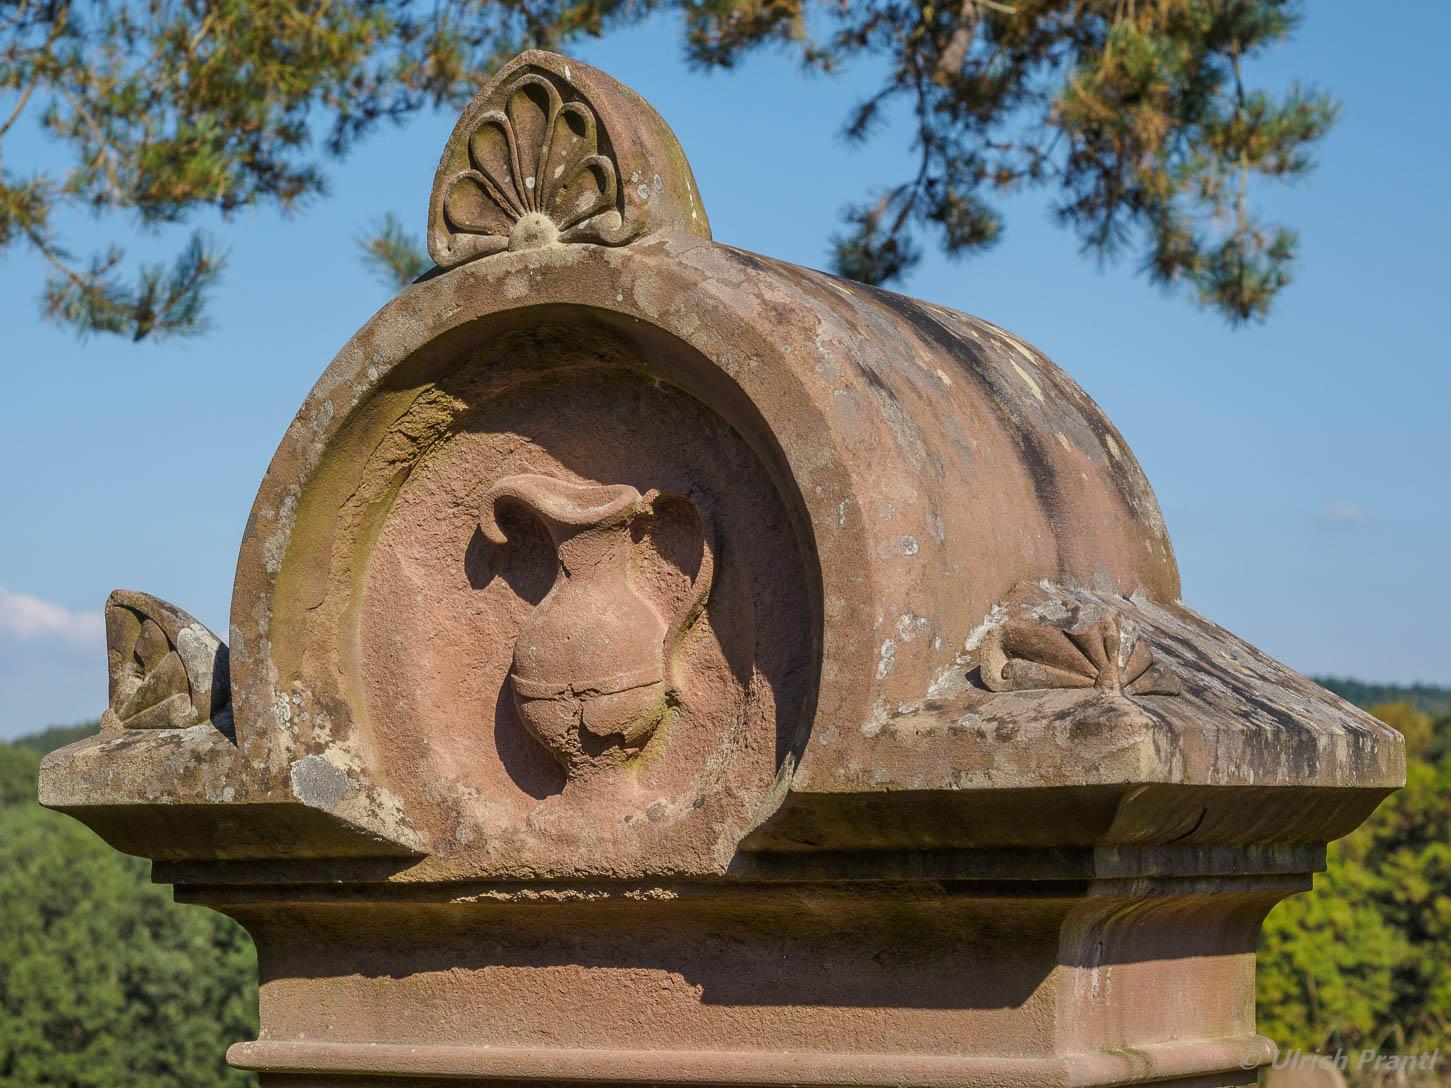 Grabmal Judenfriedhof